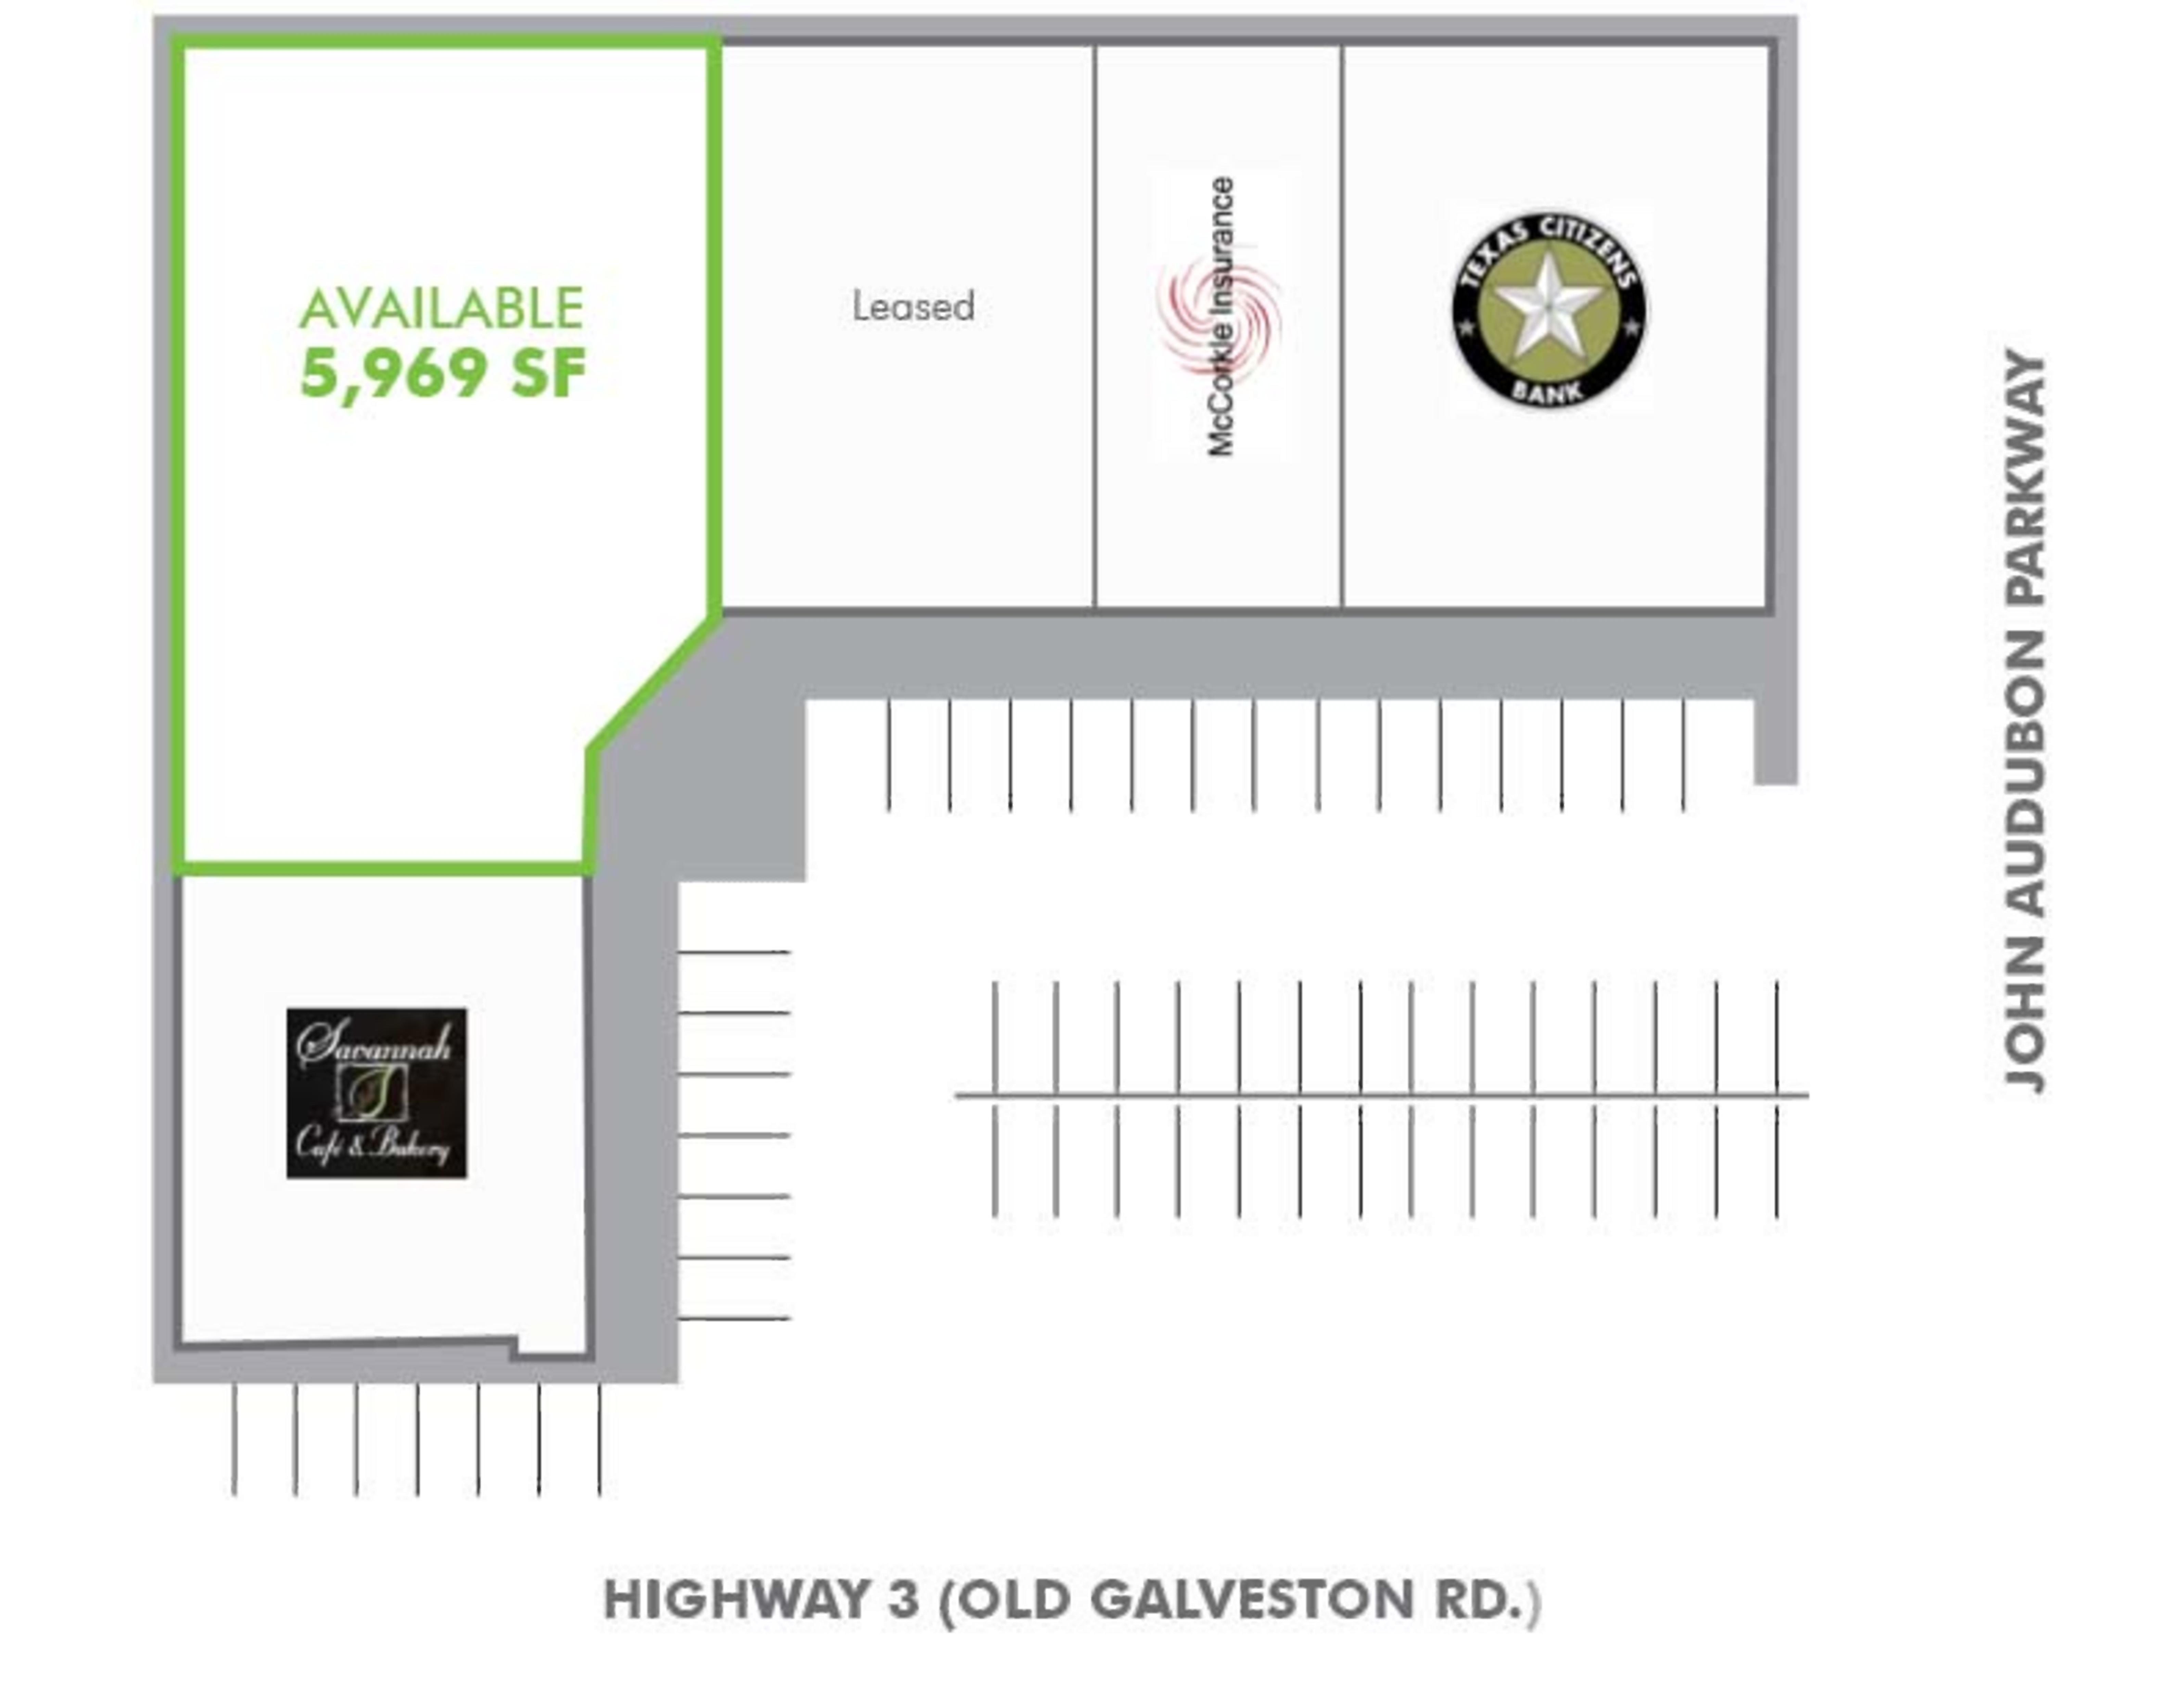 Clear Lake Retail Center: site plan